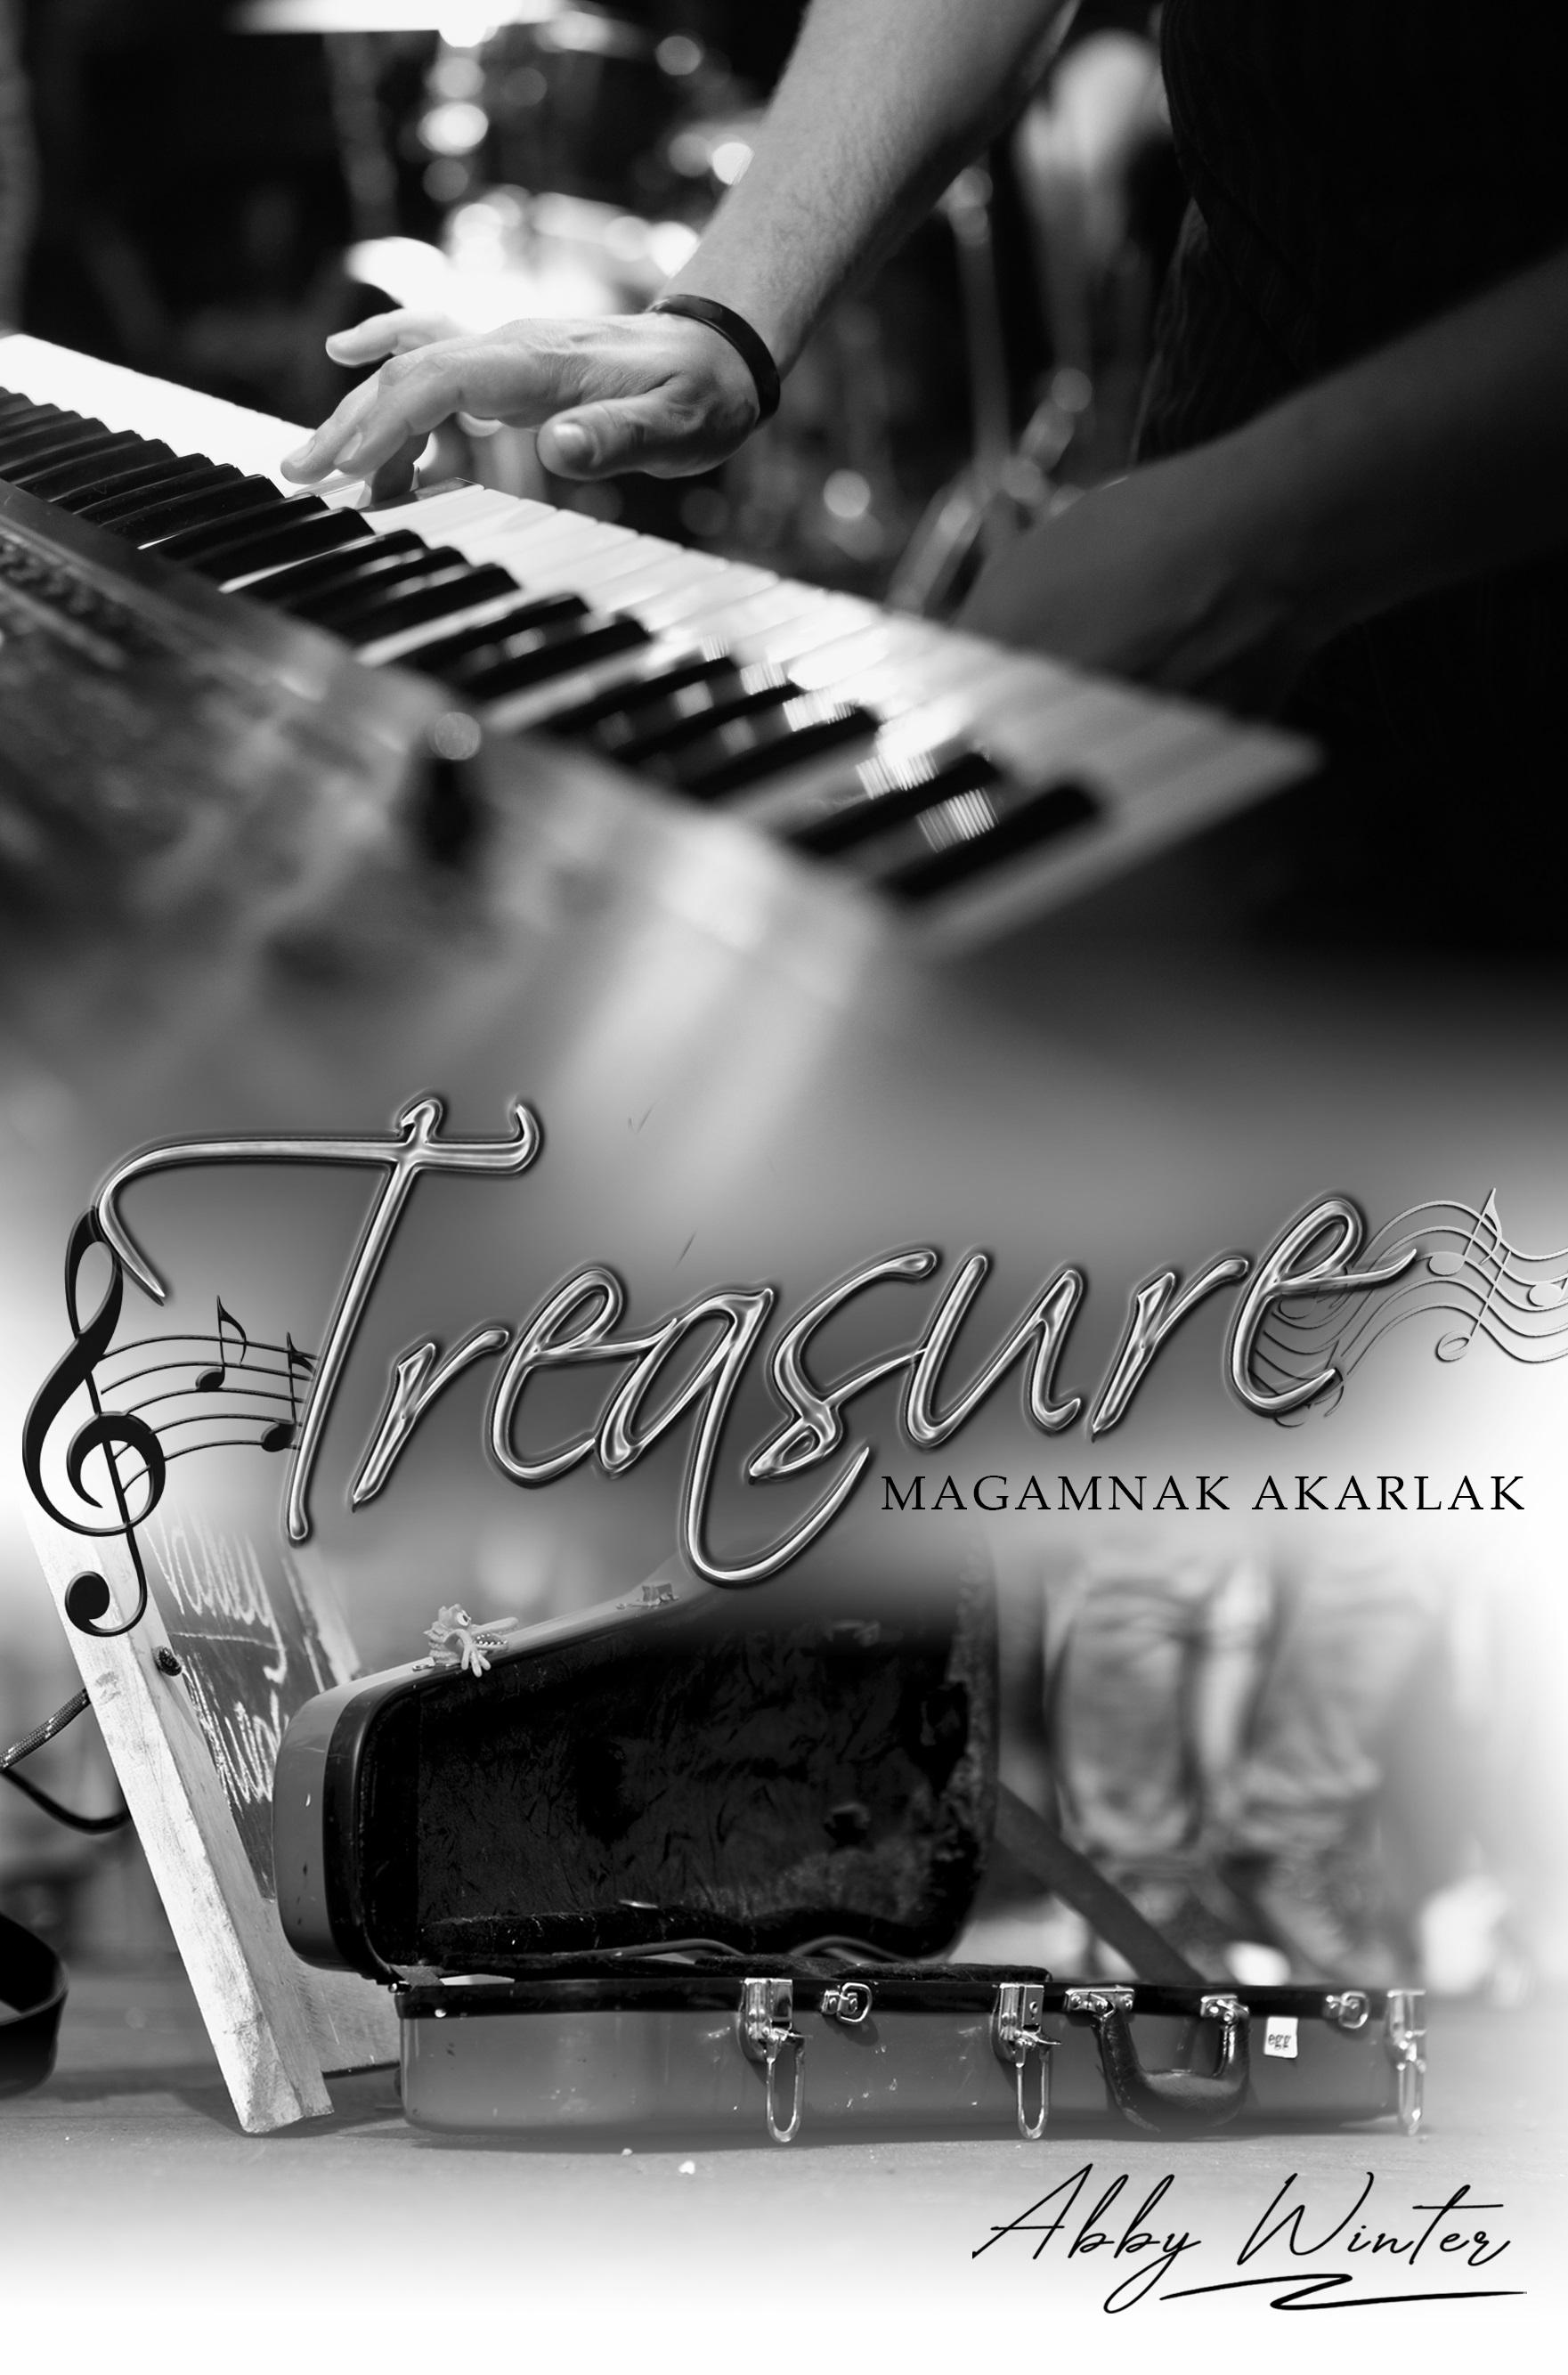 Treasure - Magamnak akarlak